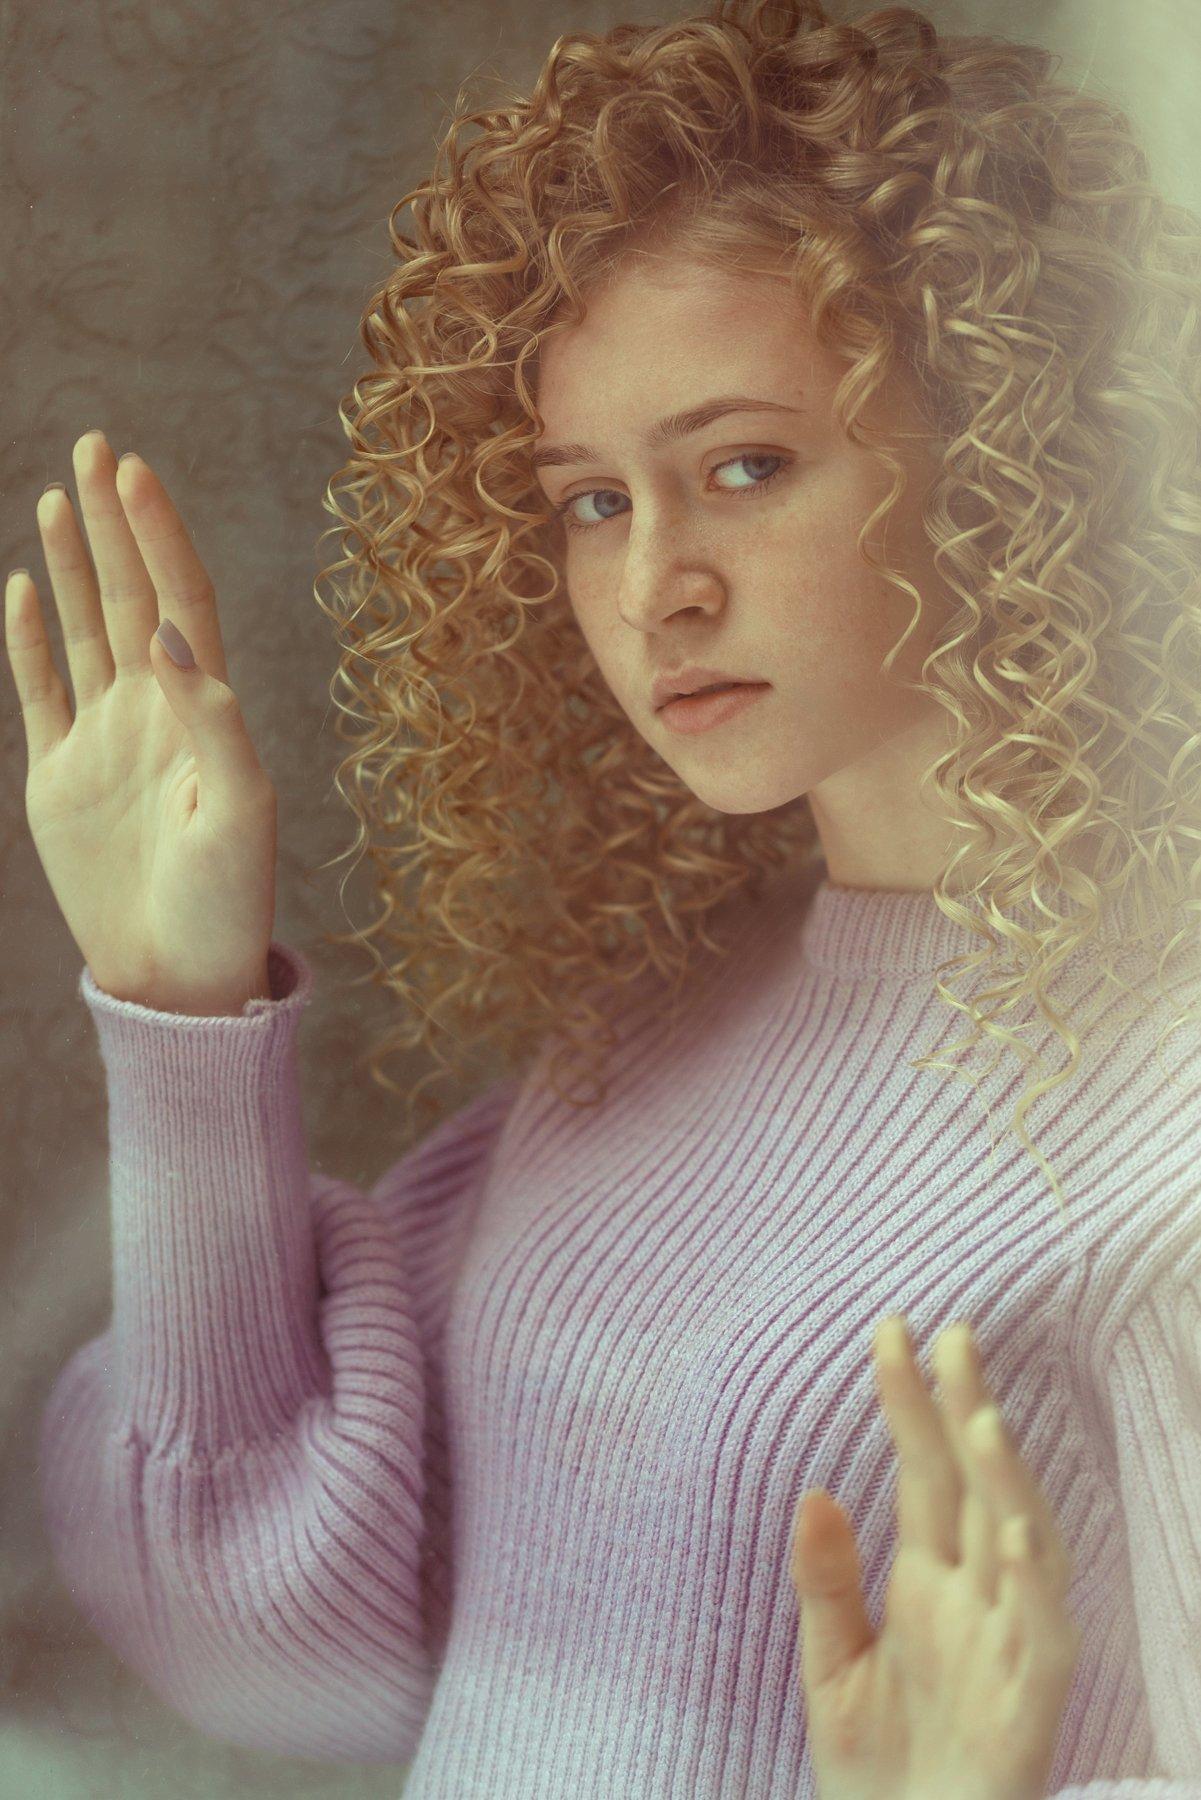 anna_degtyareva, portrait, model, gerl, nikon, , Анна Дегтярёва